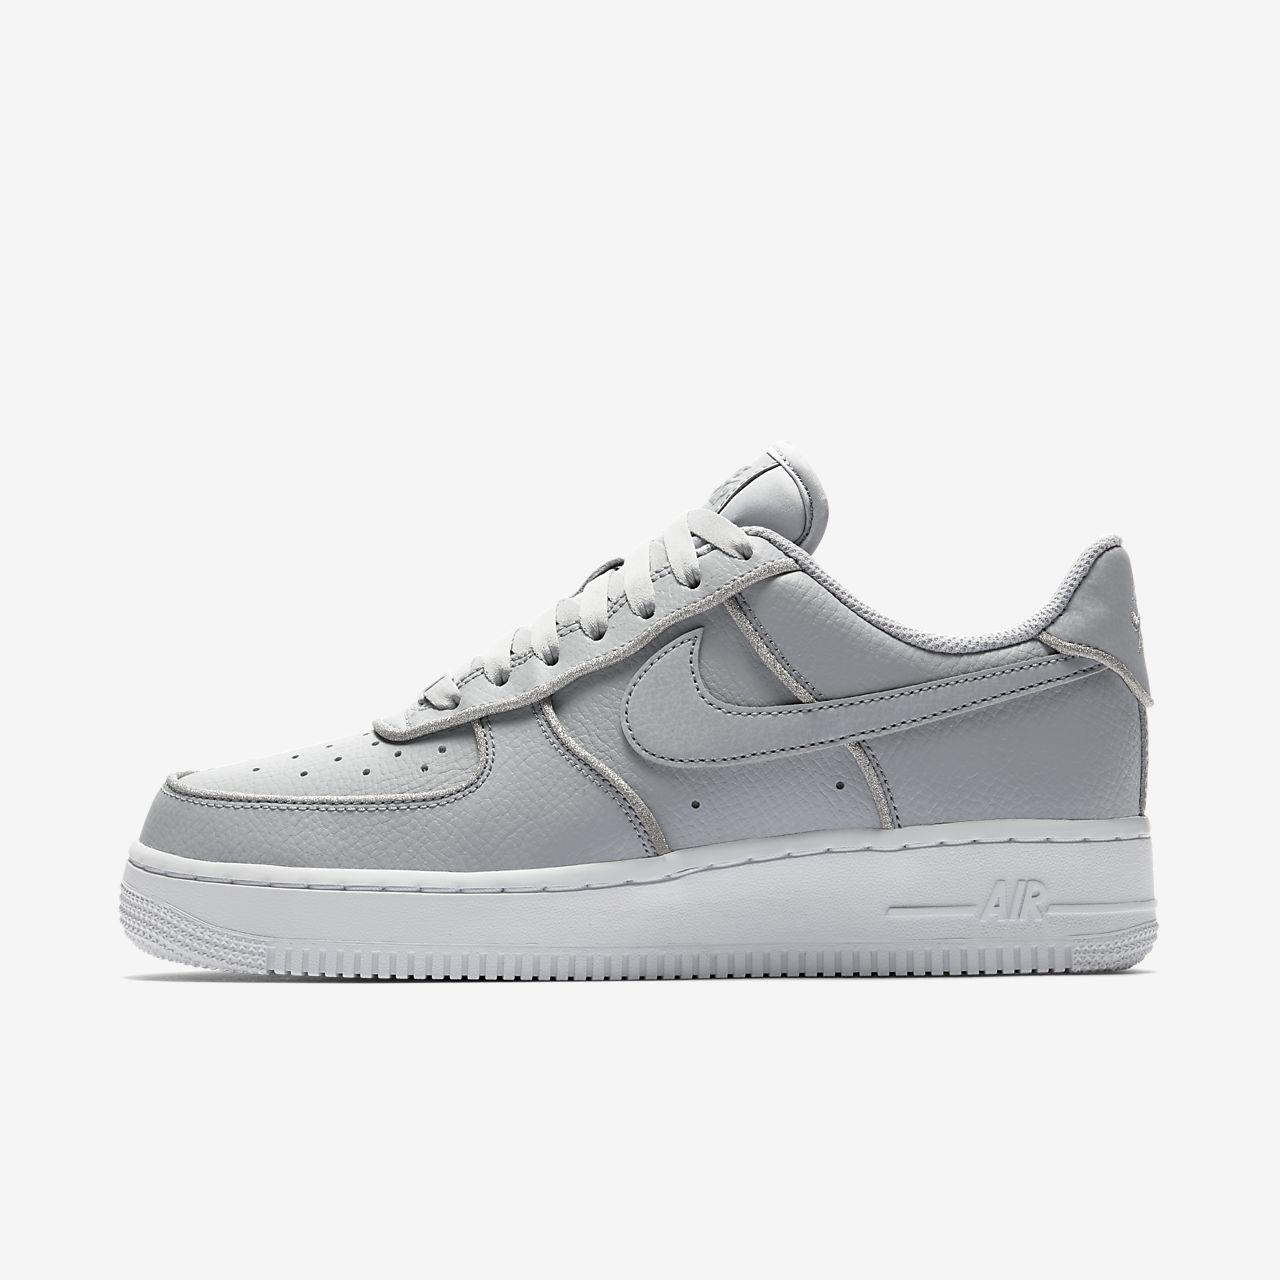 outlet store 4a058 4b7ea Sko Nike Air Force 1 Low Glitter för kvinnor